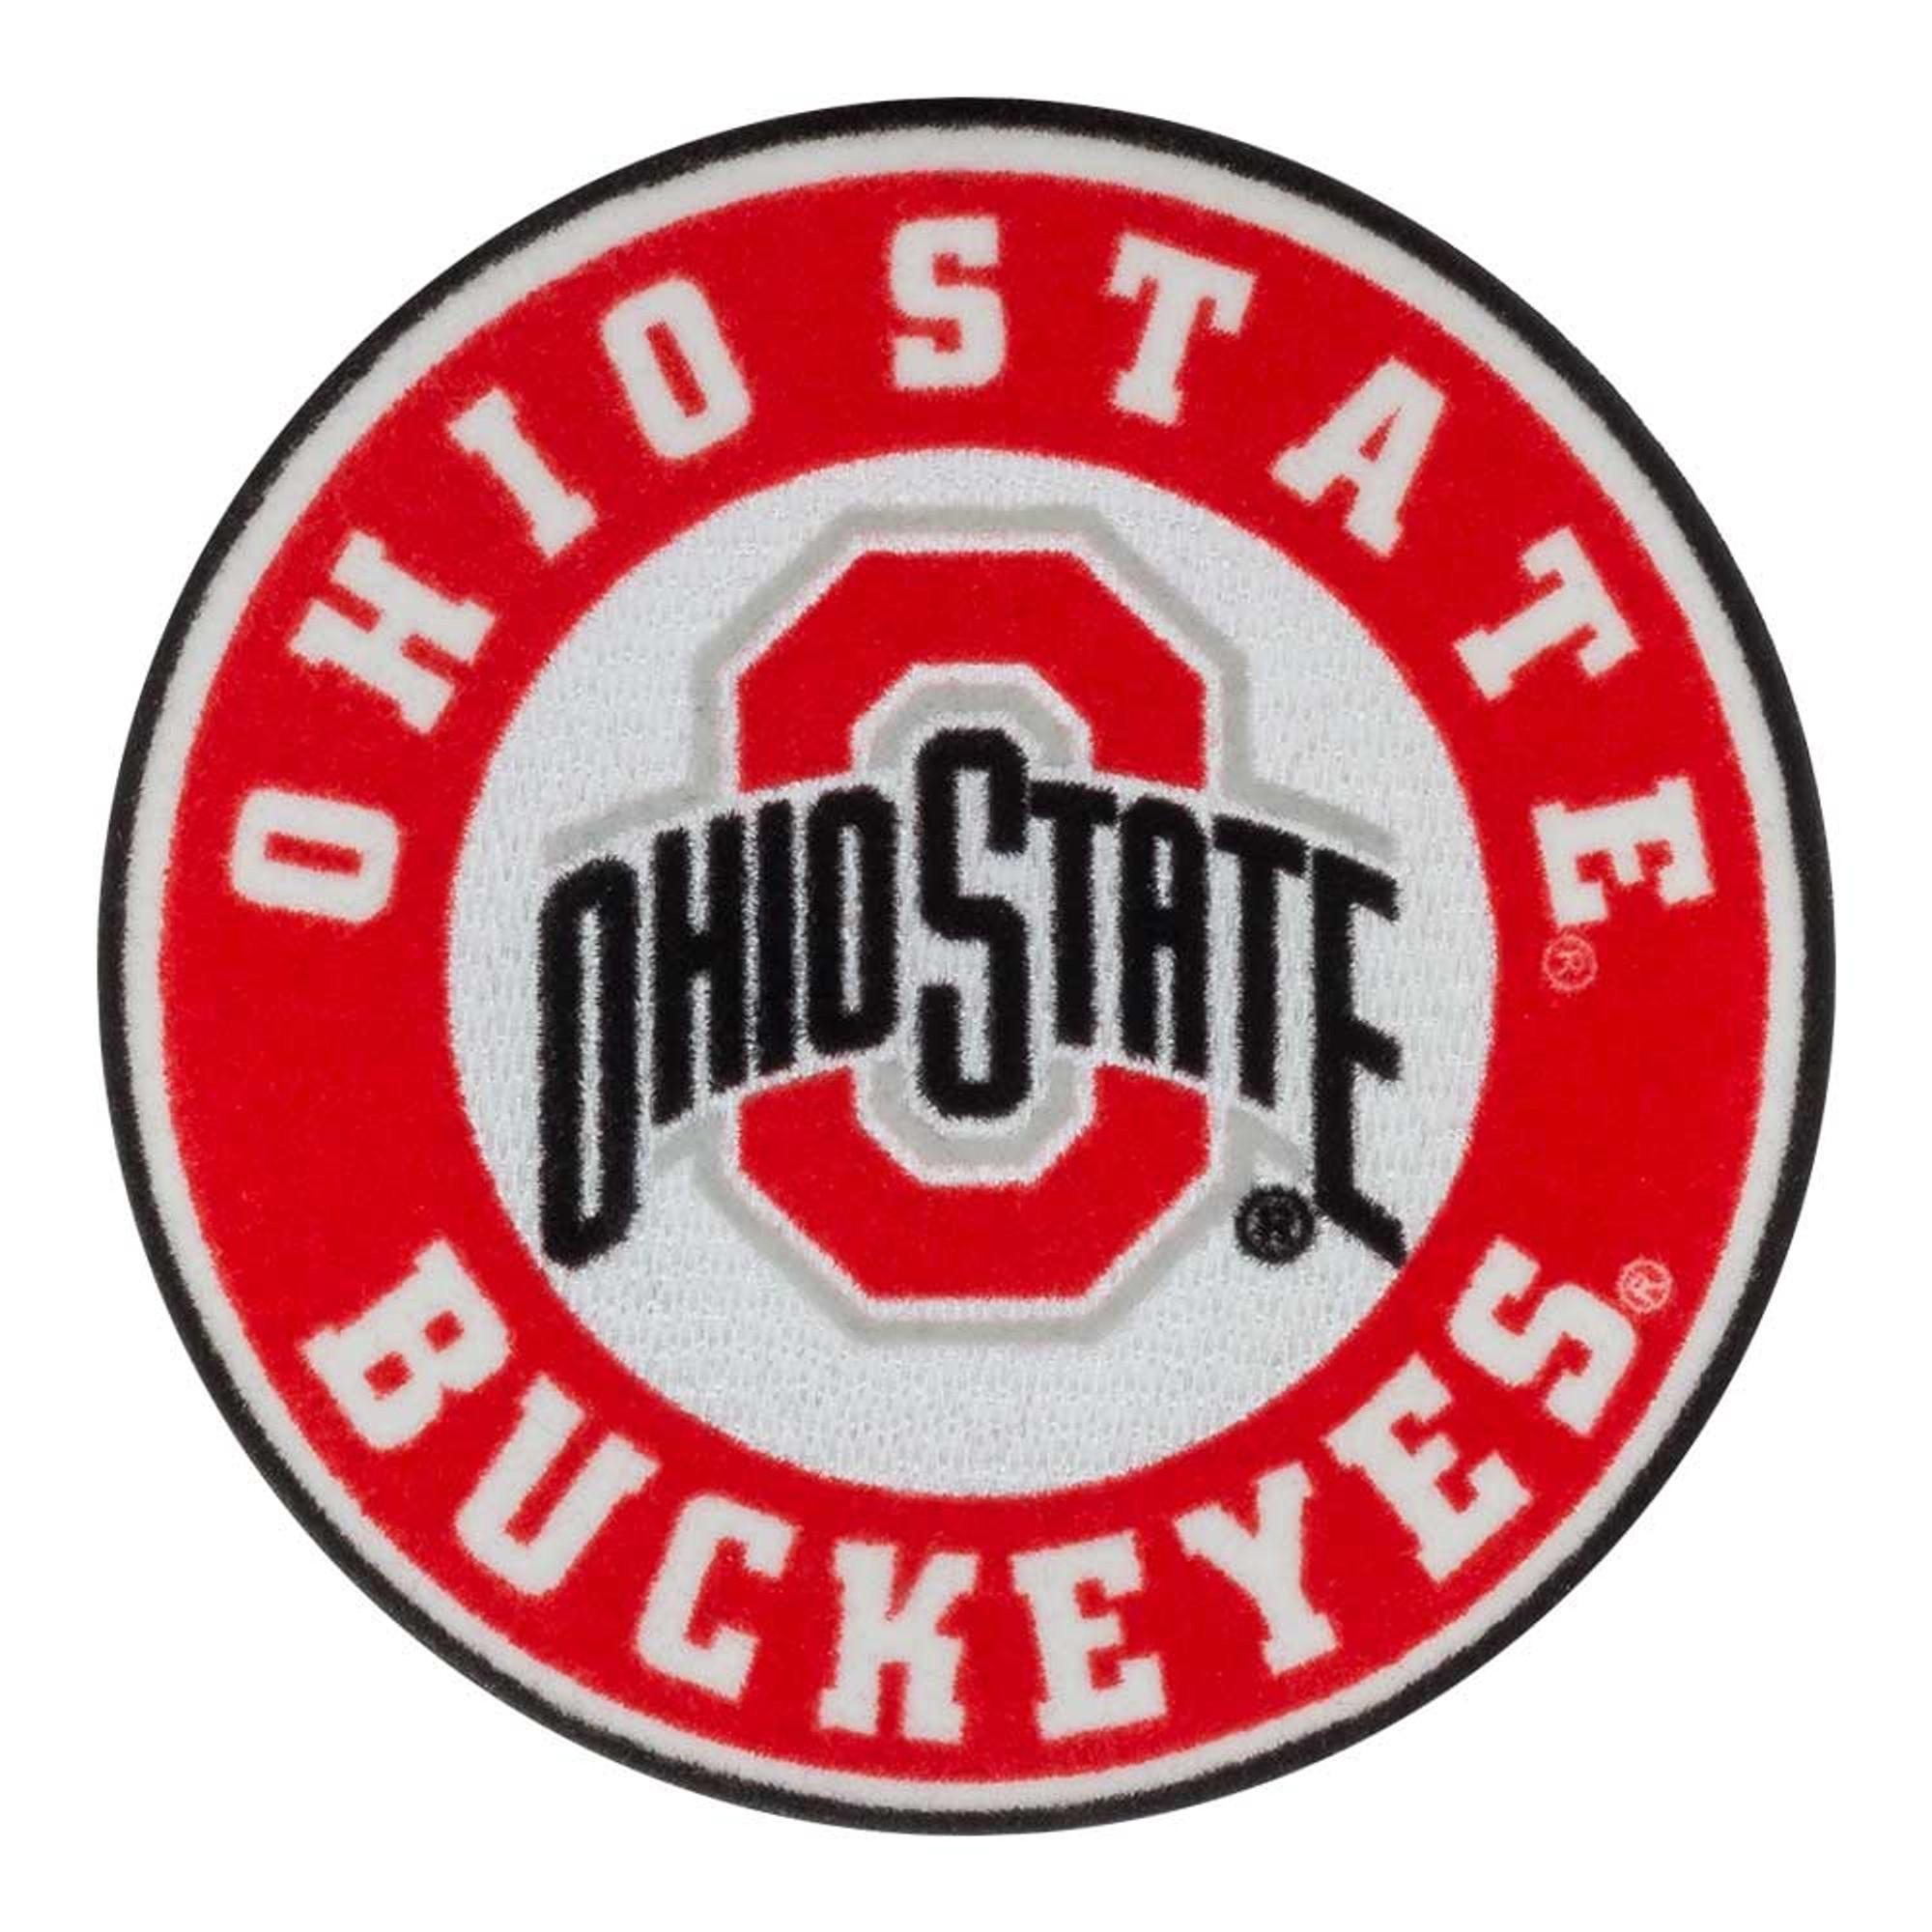 Jenkins Enterprises Ohio State Buckeyes Colored Metal Auto Emblem